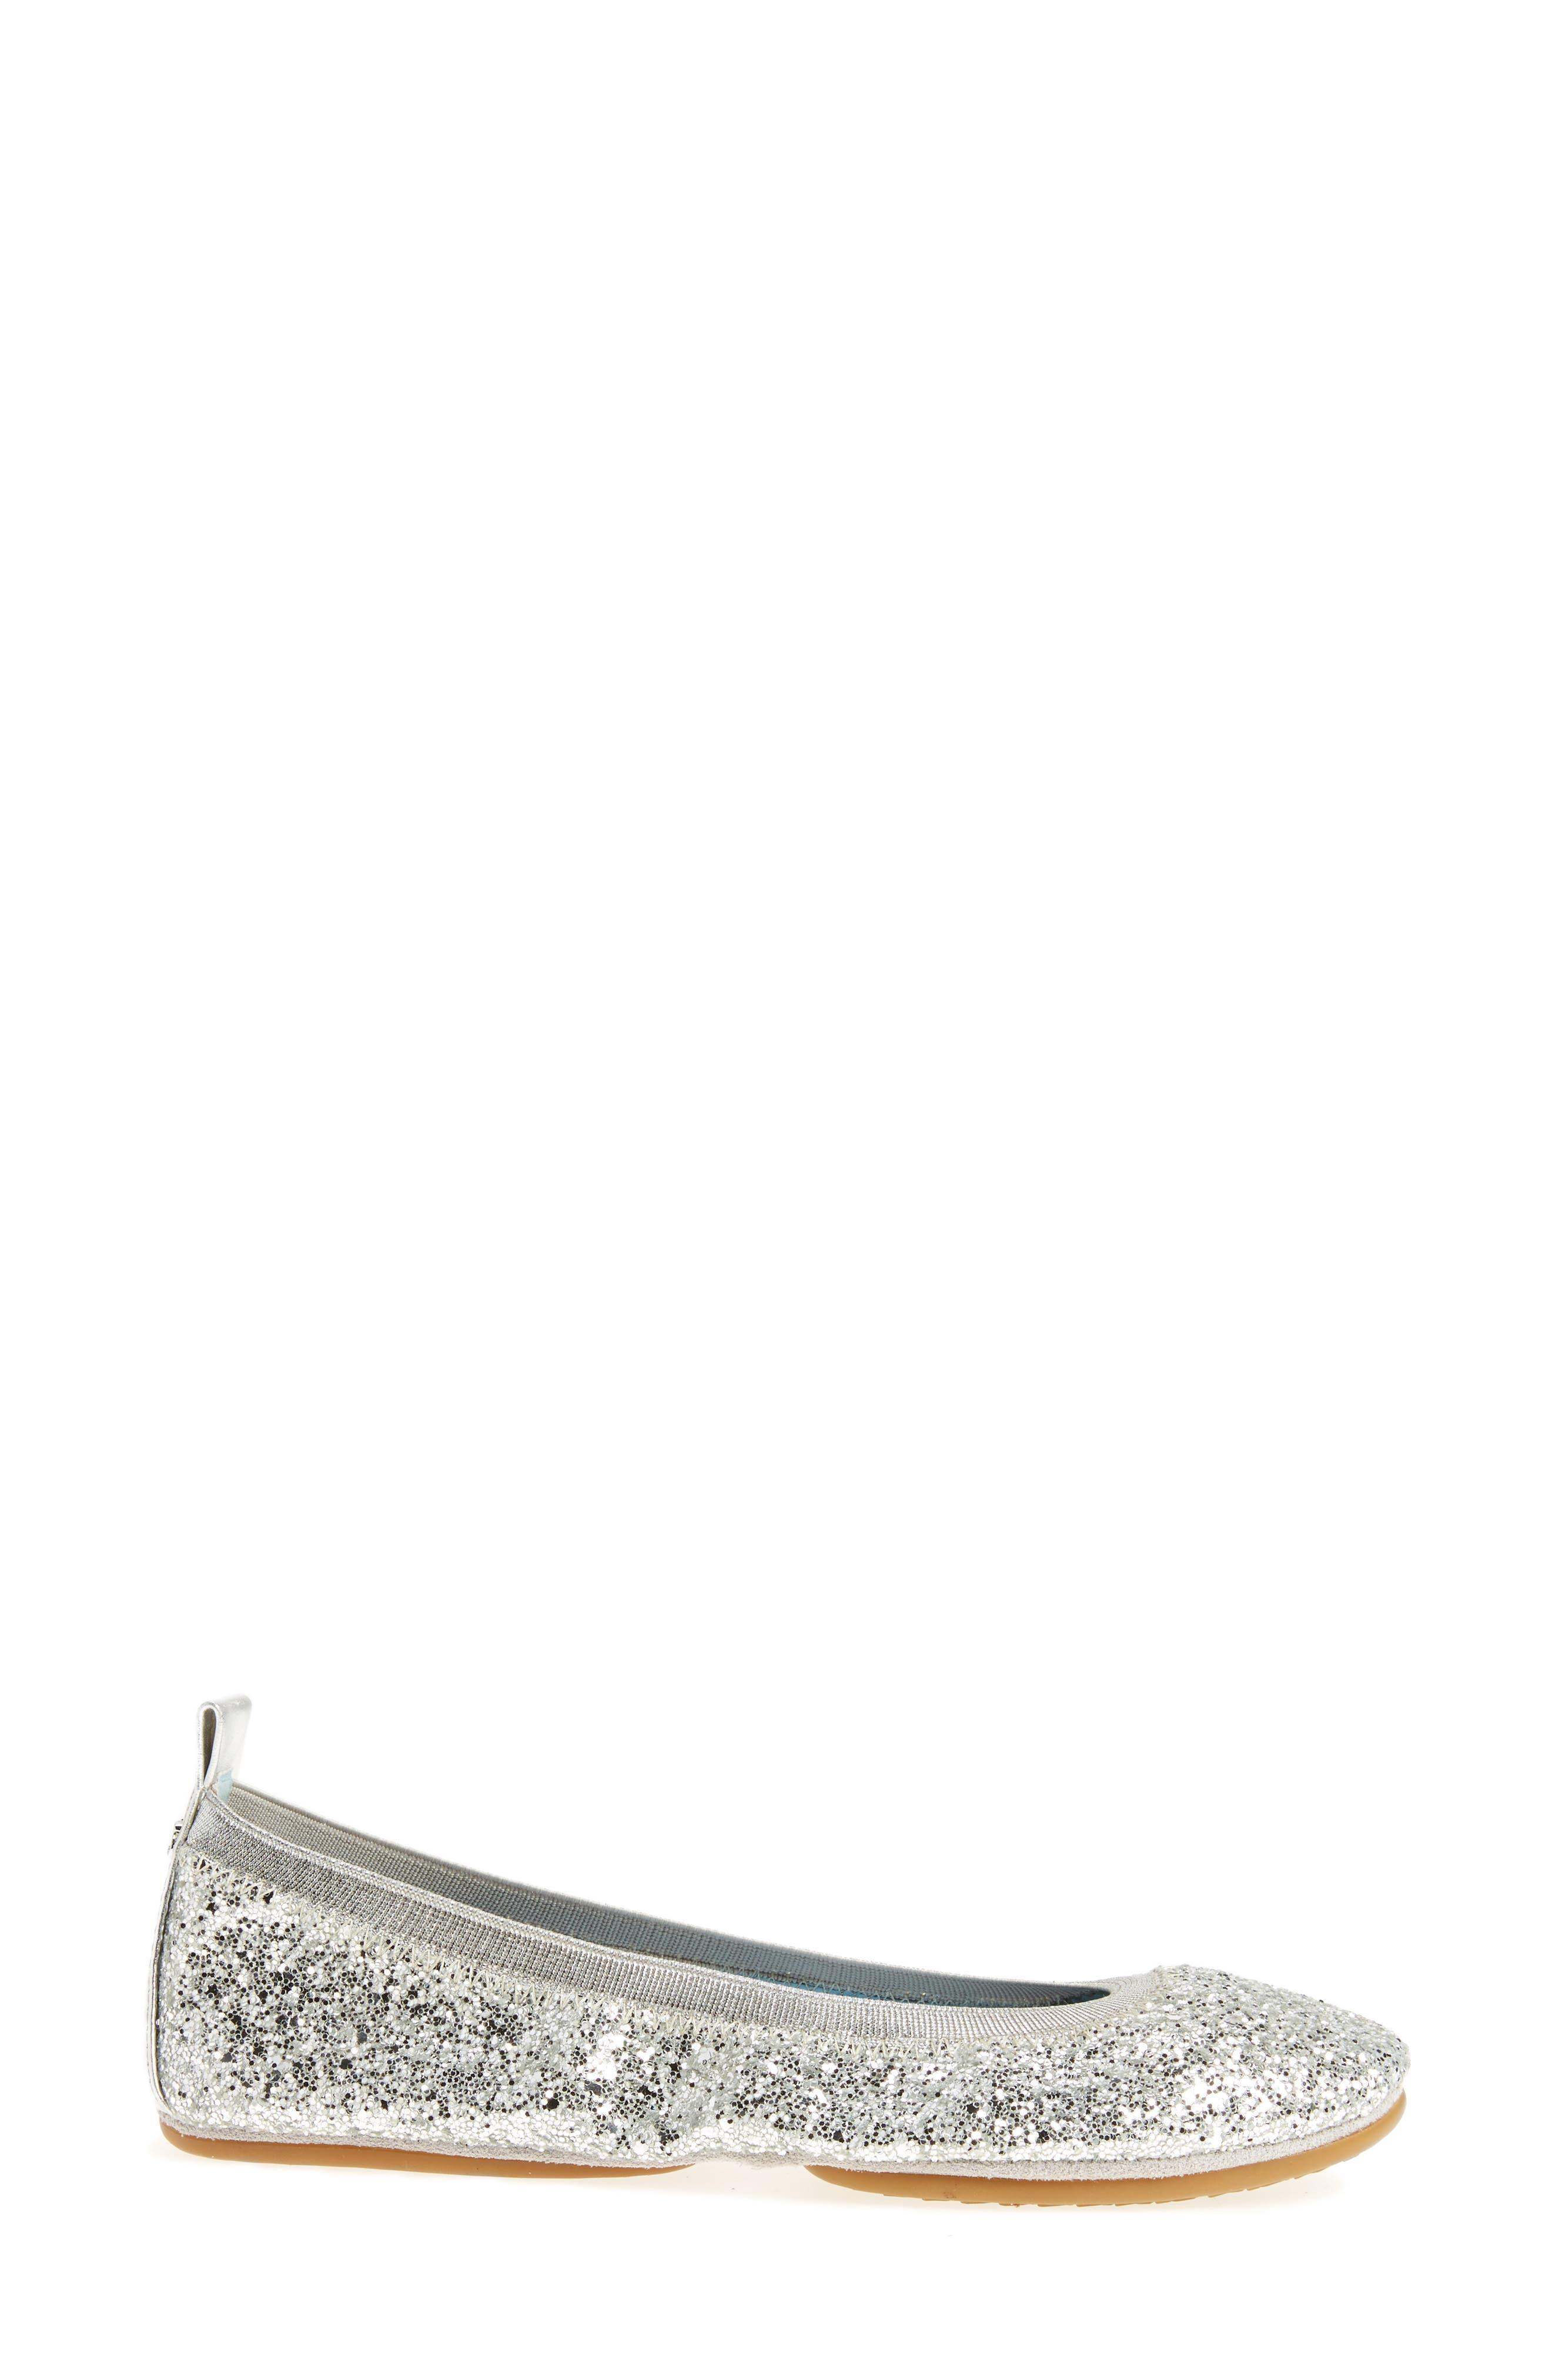 Serna Foldable Glitter Ballet Flat,                             Alternate thumbnail 9, color,